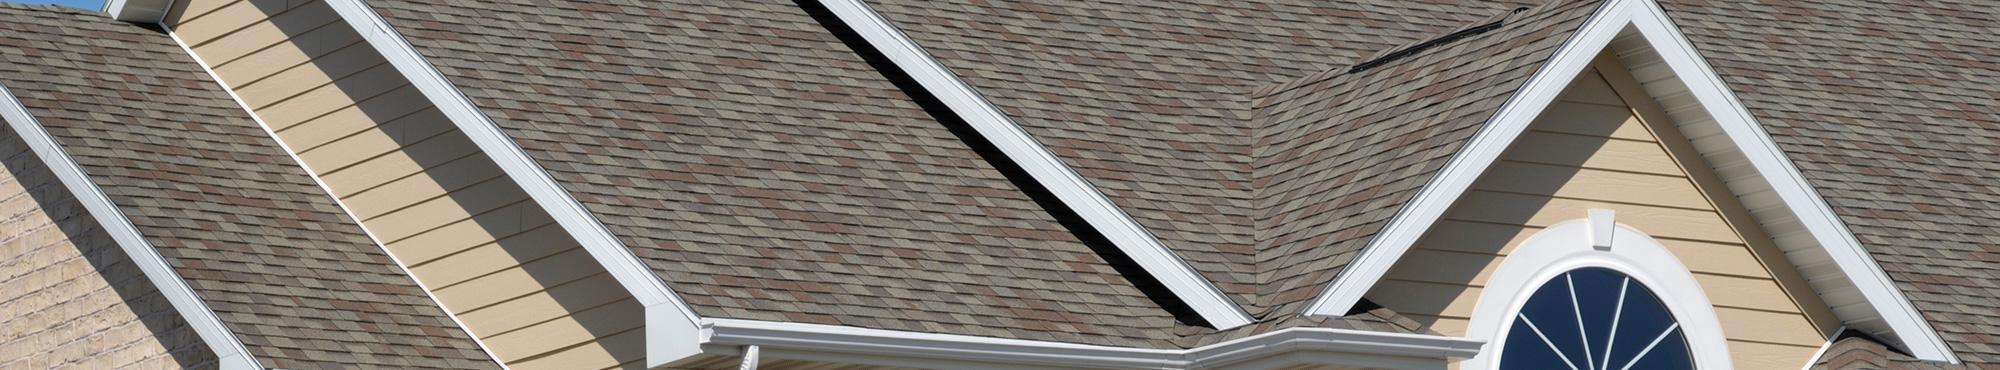 West Coast Roofers LLC